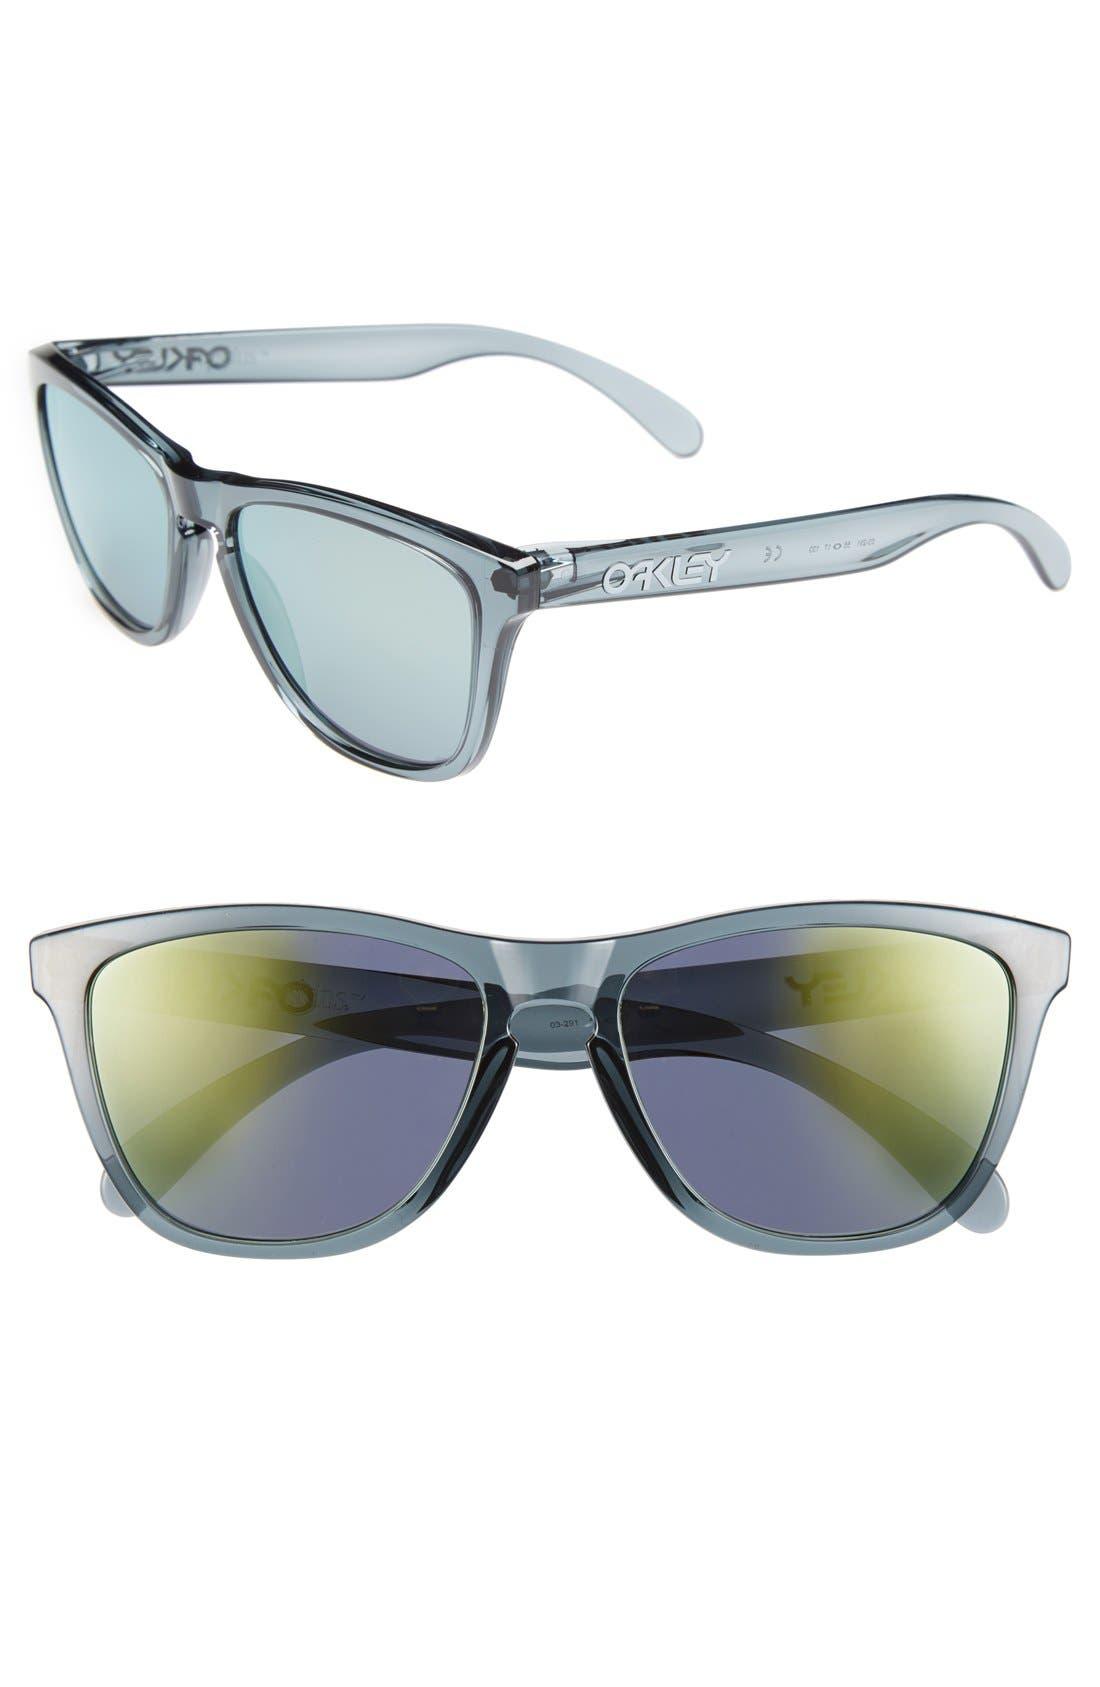 Alternate Image 1 Selected - Oakley 'Frogskins™' 55mm Sunglasses